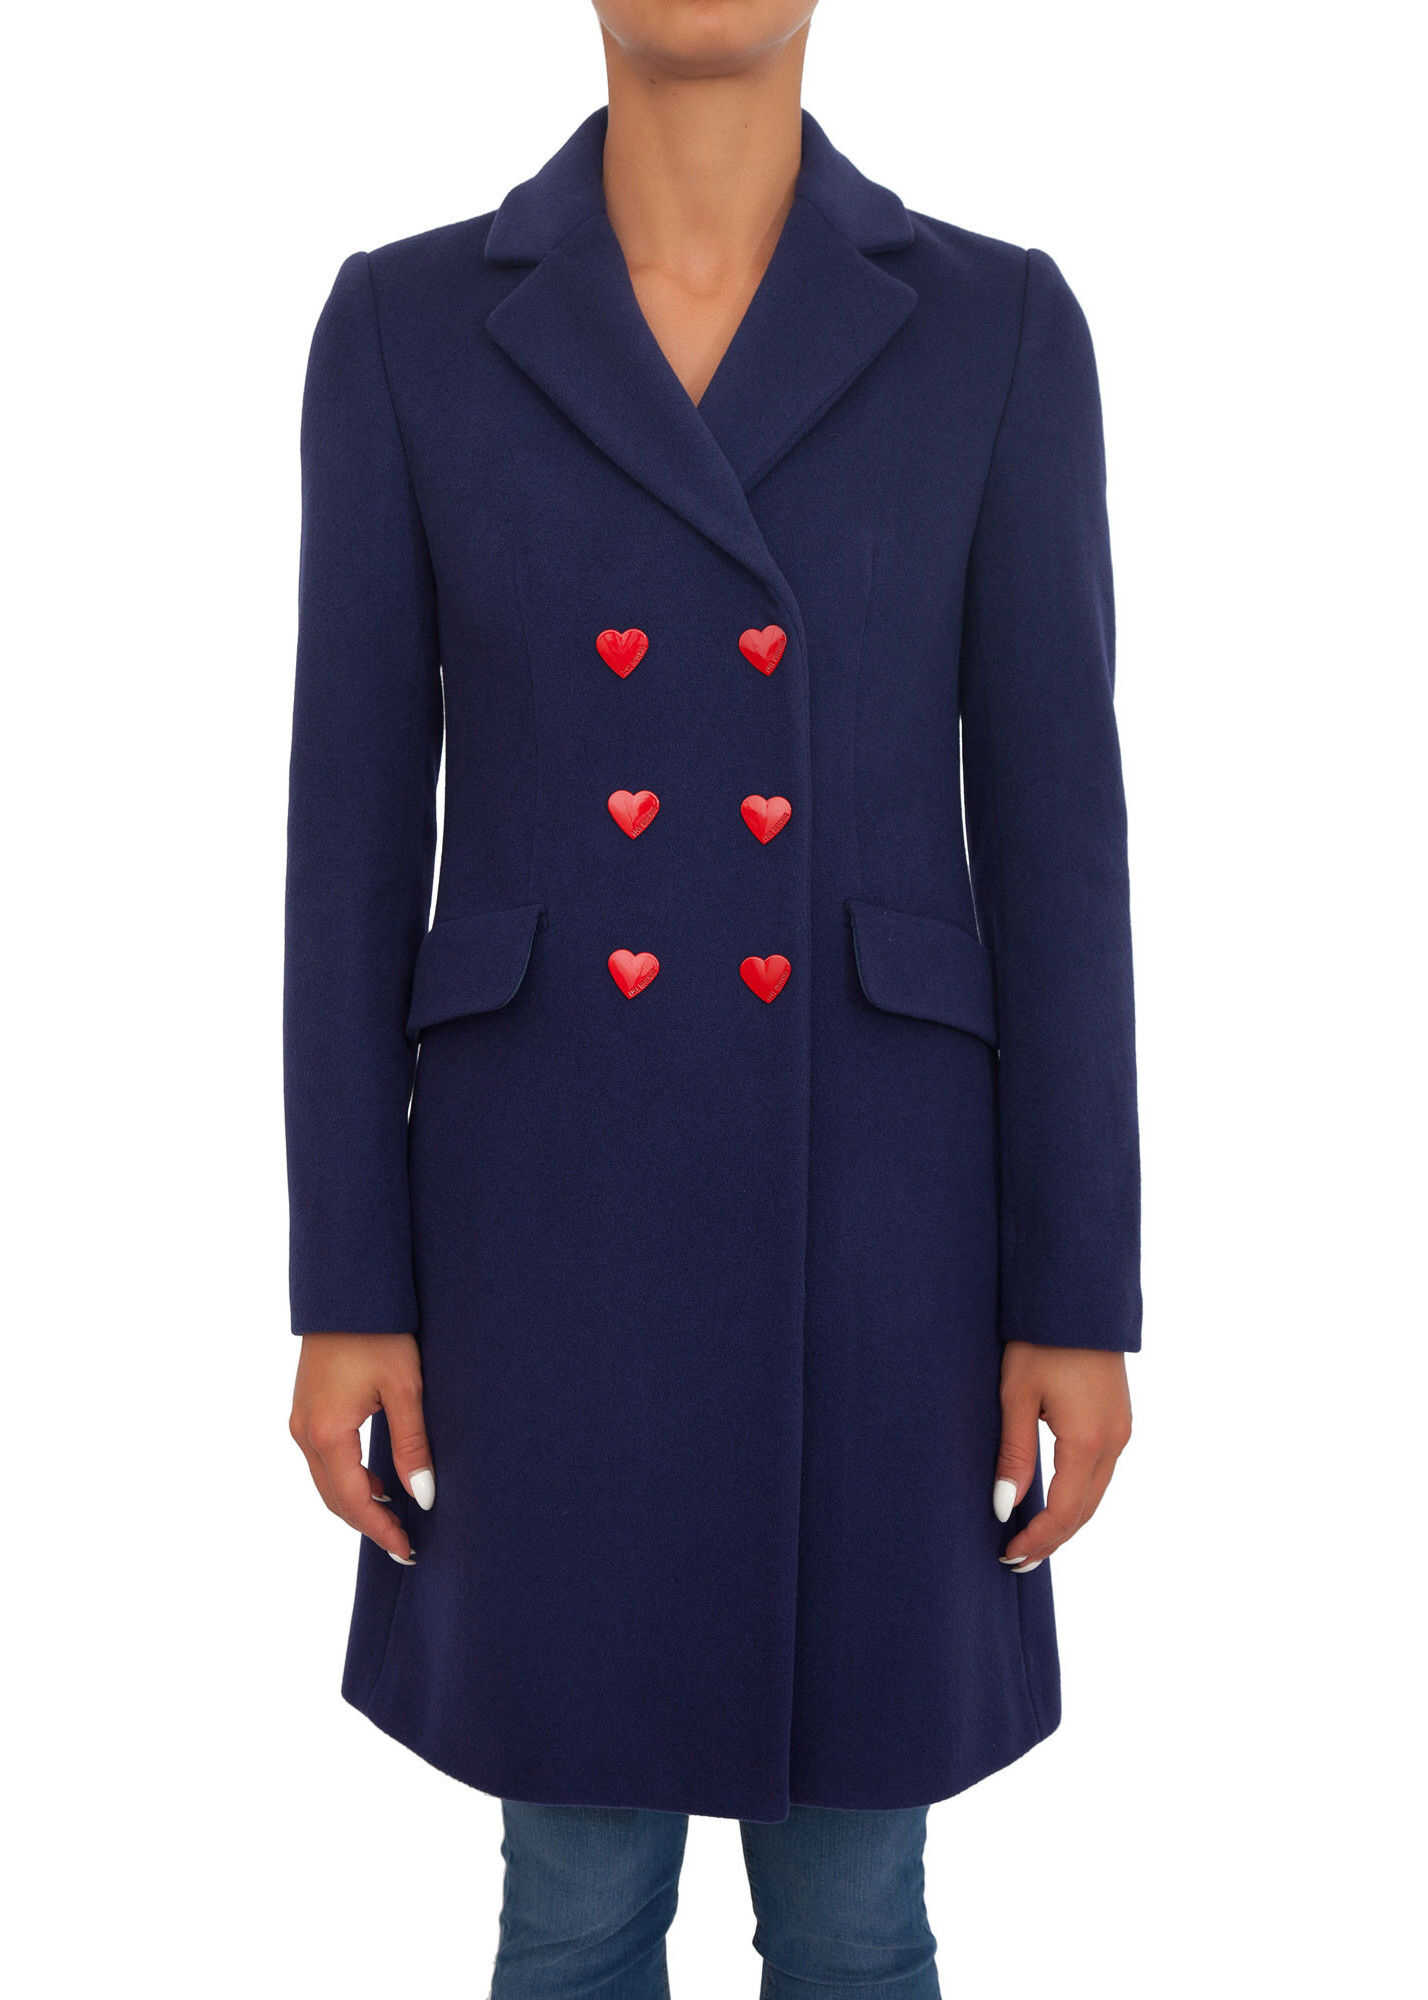 LOVE Moschino BC039F10 BLUE